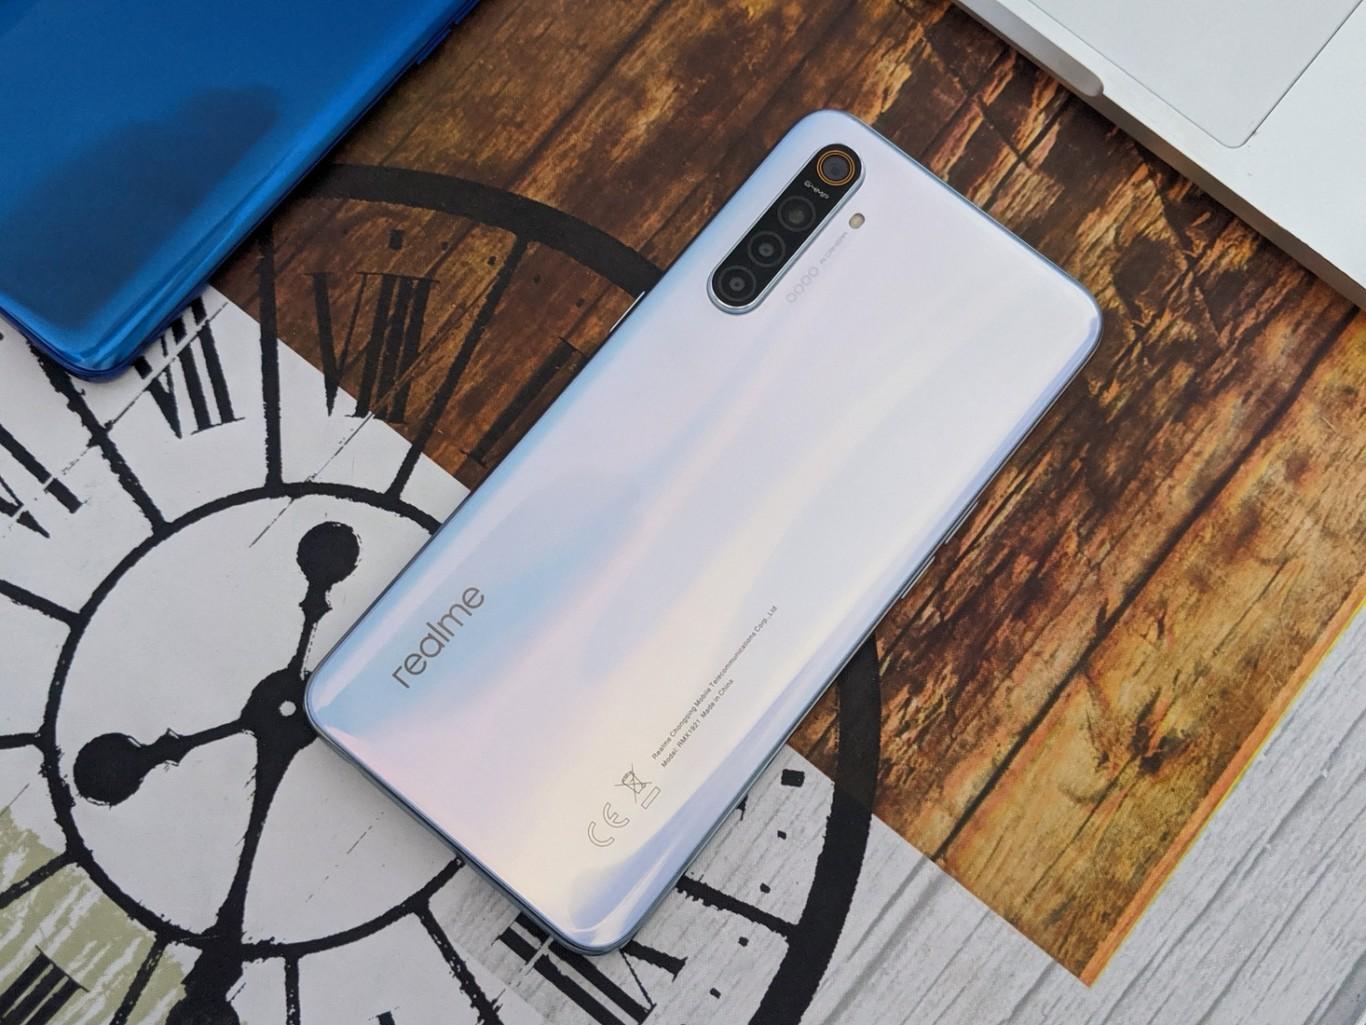 iPhone 11, Realme X2, Samsung Galaxy S10+, Huawei P30 y grandes ofertas en ordenadores e informática: llega Cazando Gangas